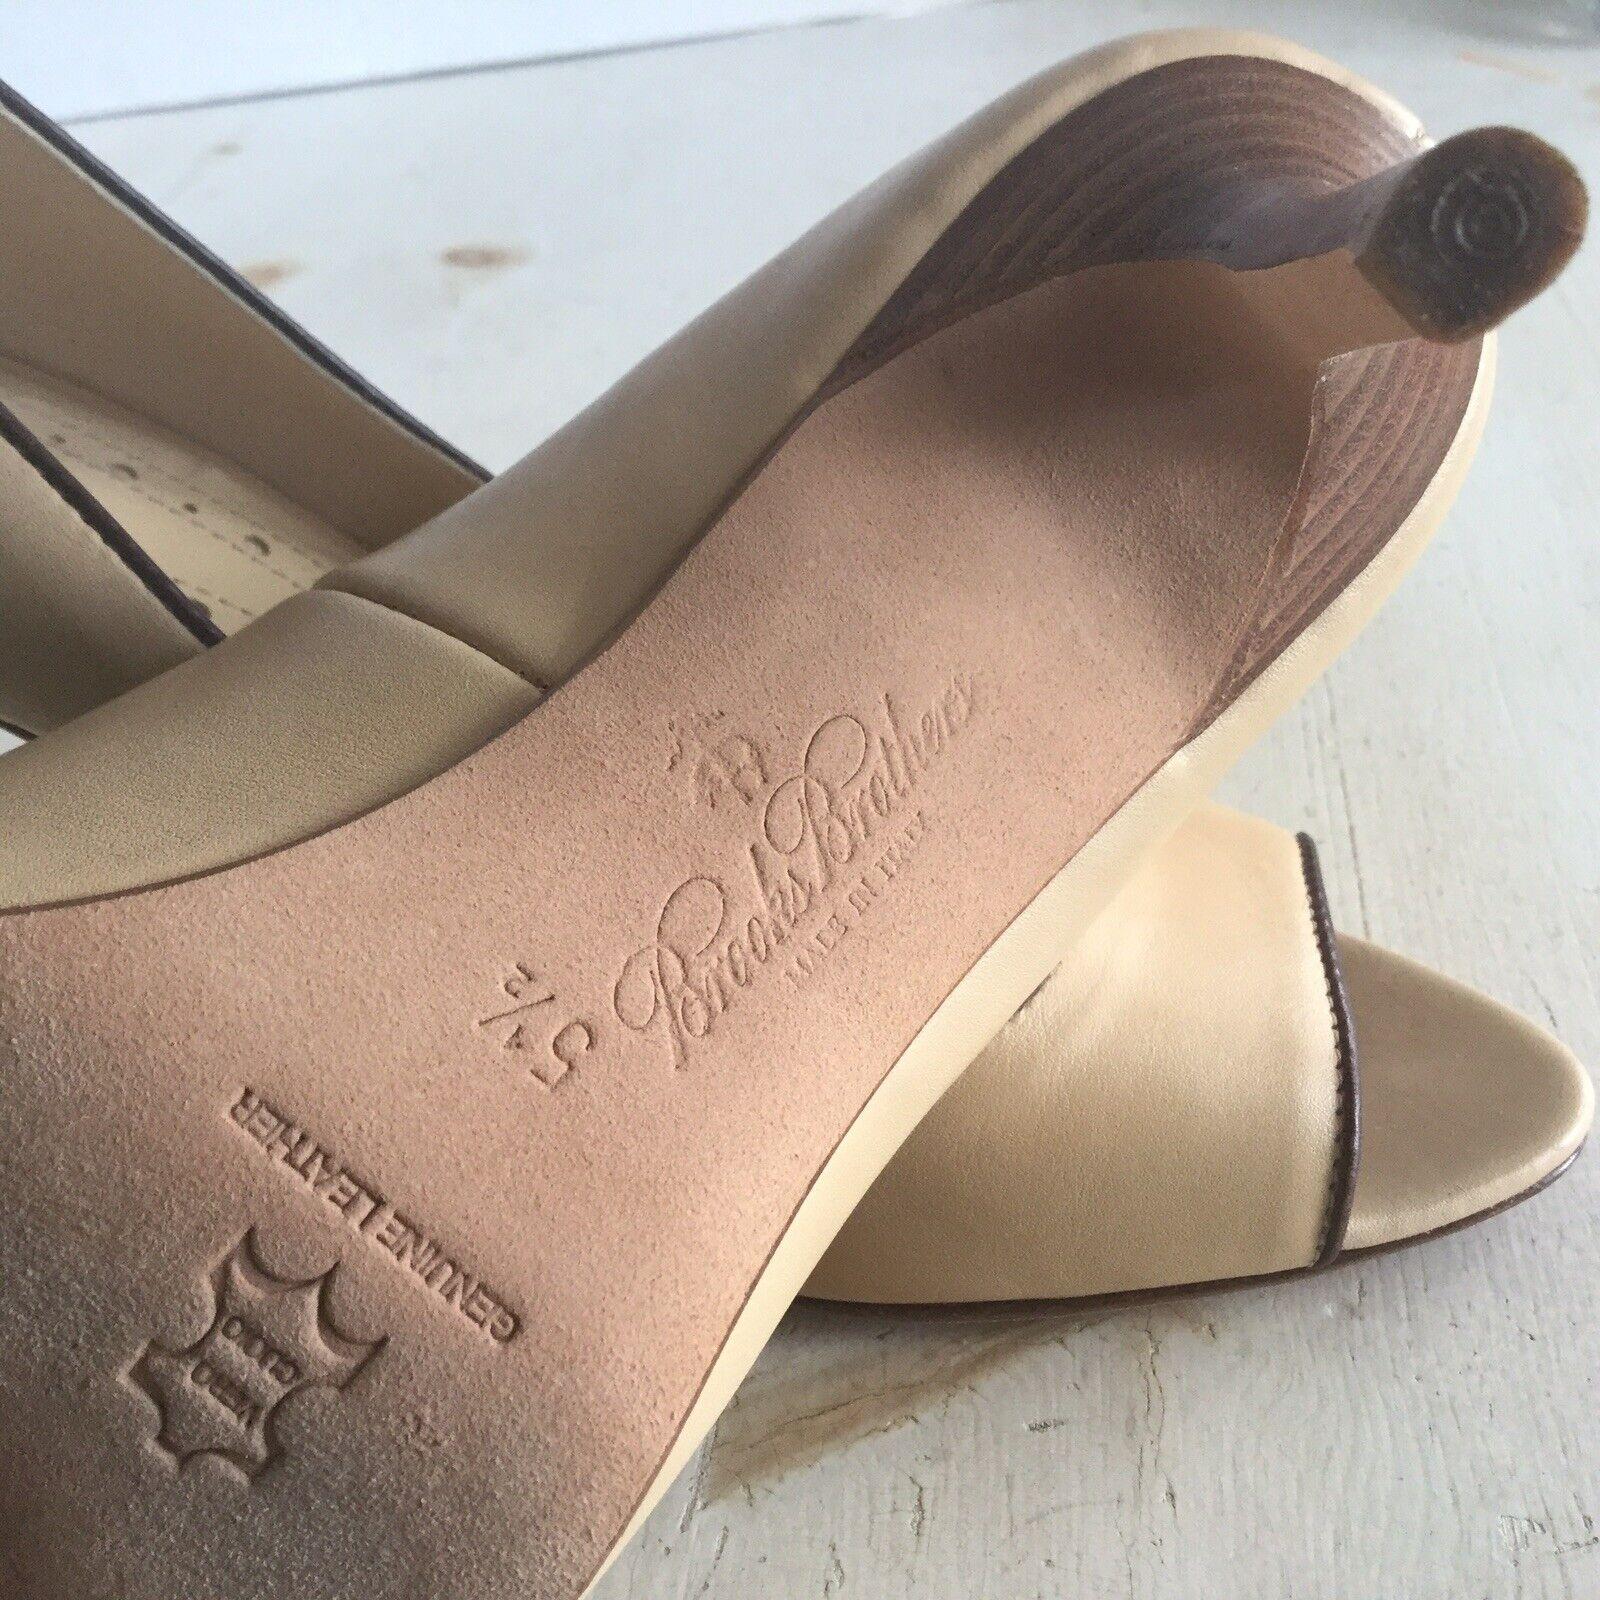 Brooks Brooks Brooks Brothers Open Toe Leather Pumps  schuhe 5.5 5 1 2 Creamy Tan Neutral 0d7c49